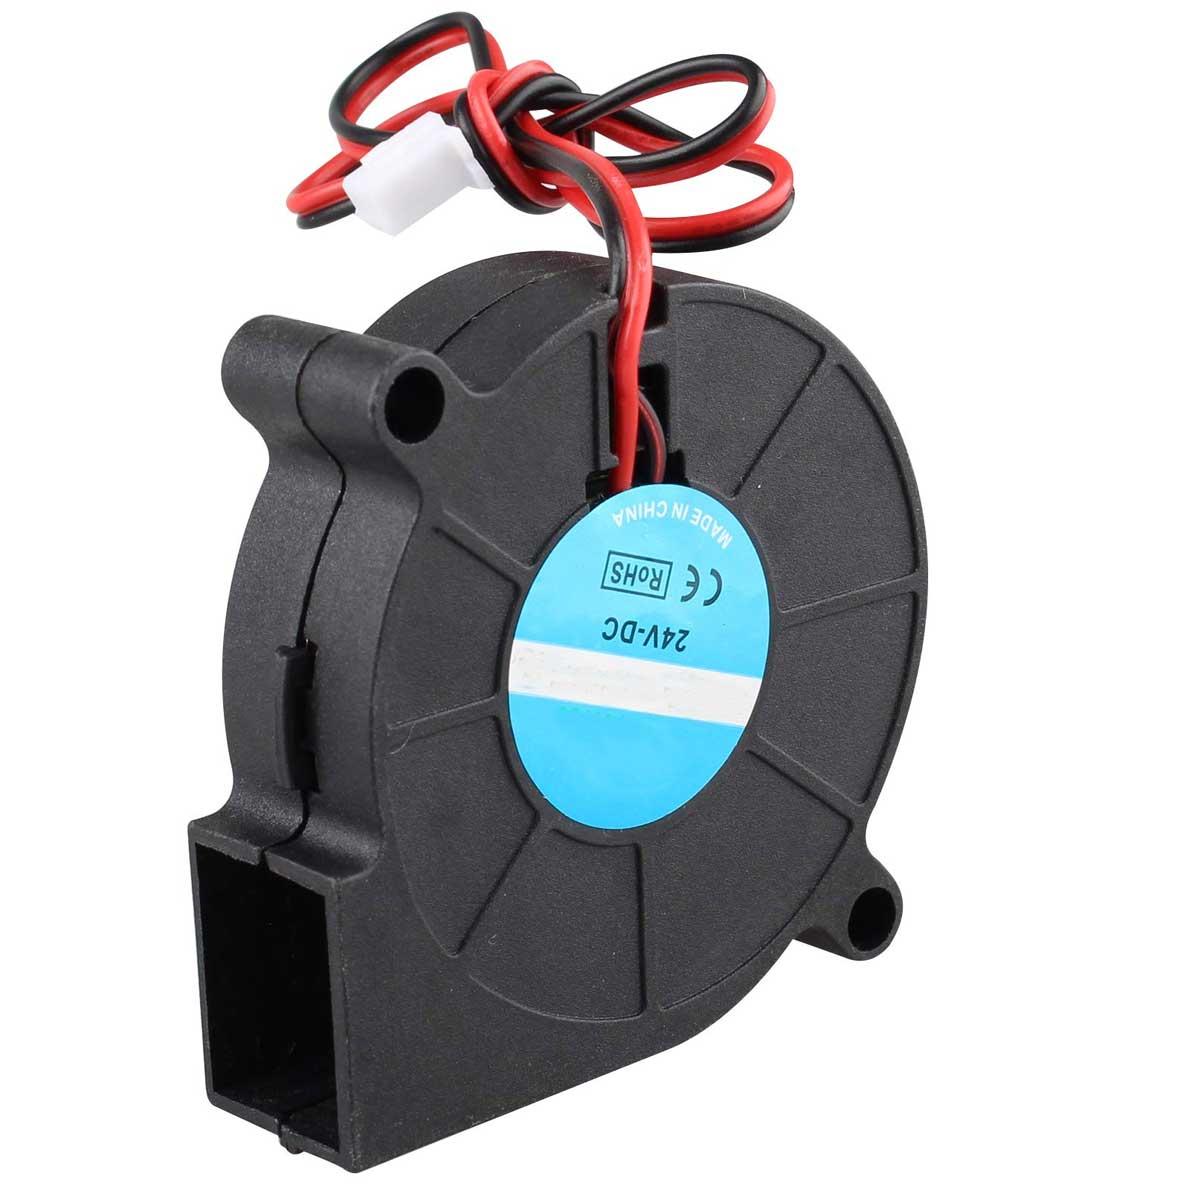 Cooler / Turbina / Ventilador 12v Radial 5015 Hotend para impressora 3D